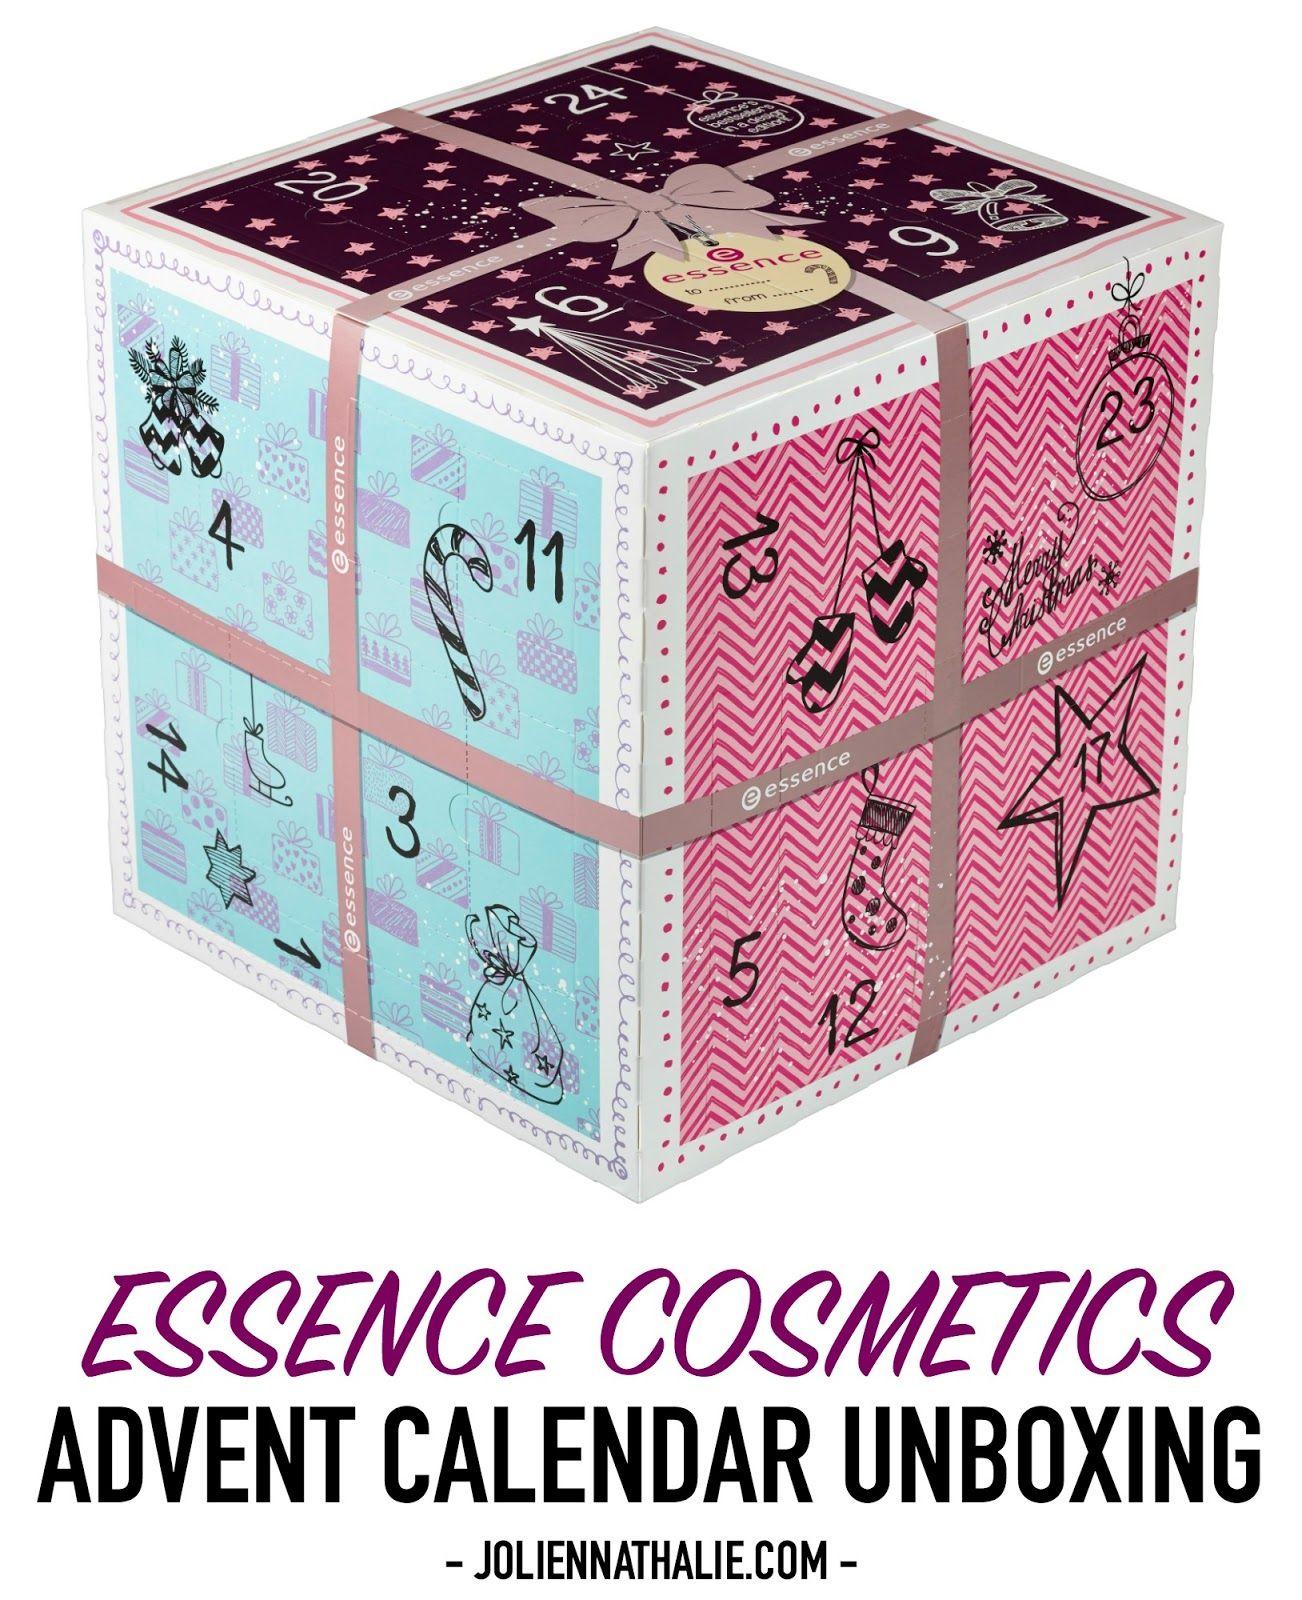 Essence Cosmetics Christmas Countdown ADVENT CALENDAR 2016 Unboxing ...